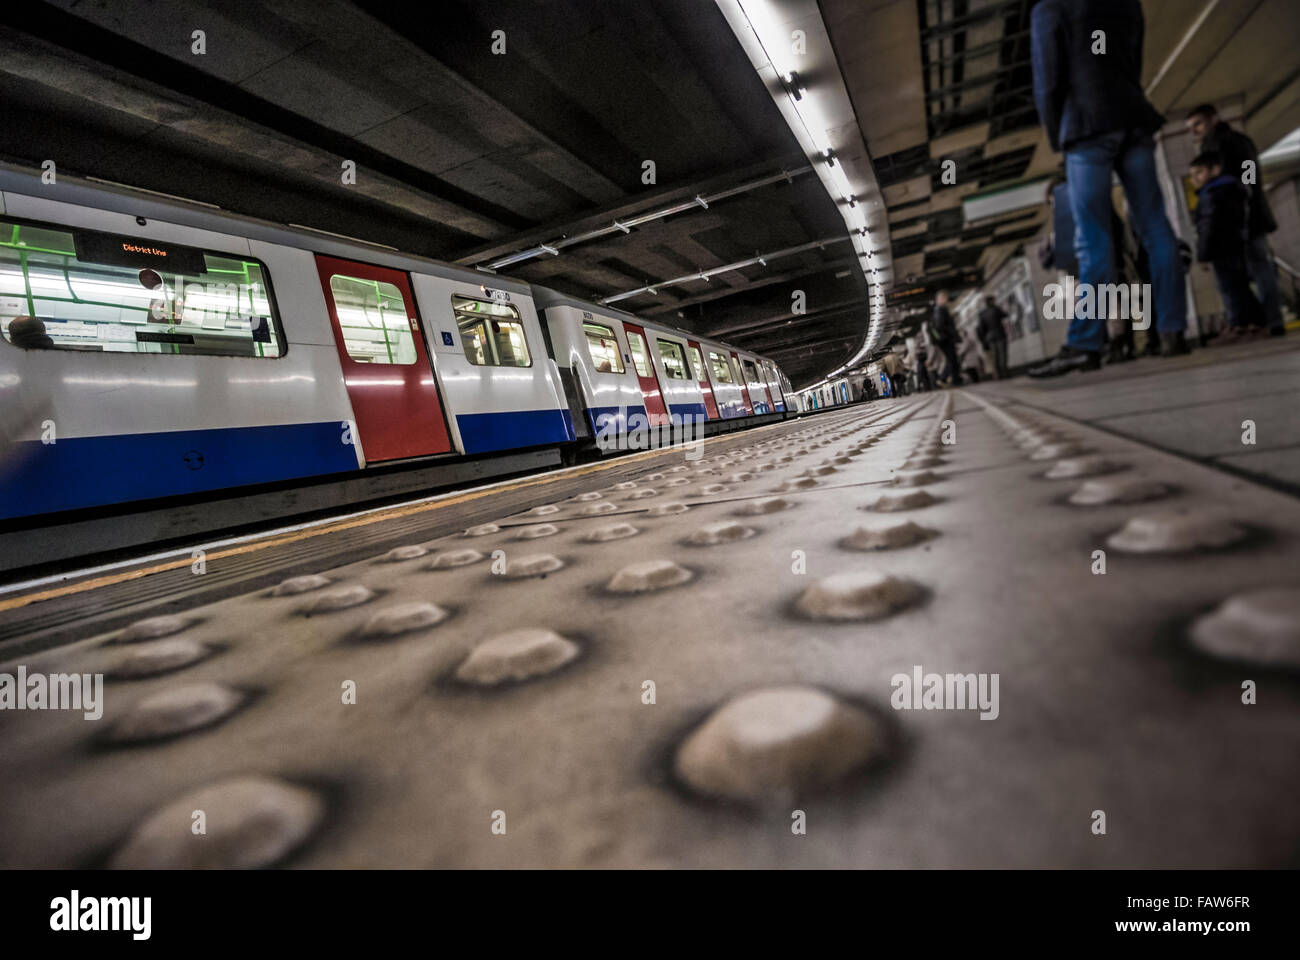 London underground station with tube train and platform - Stock Image